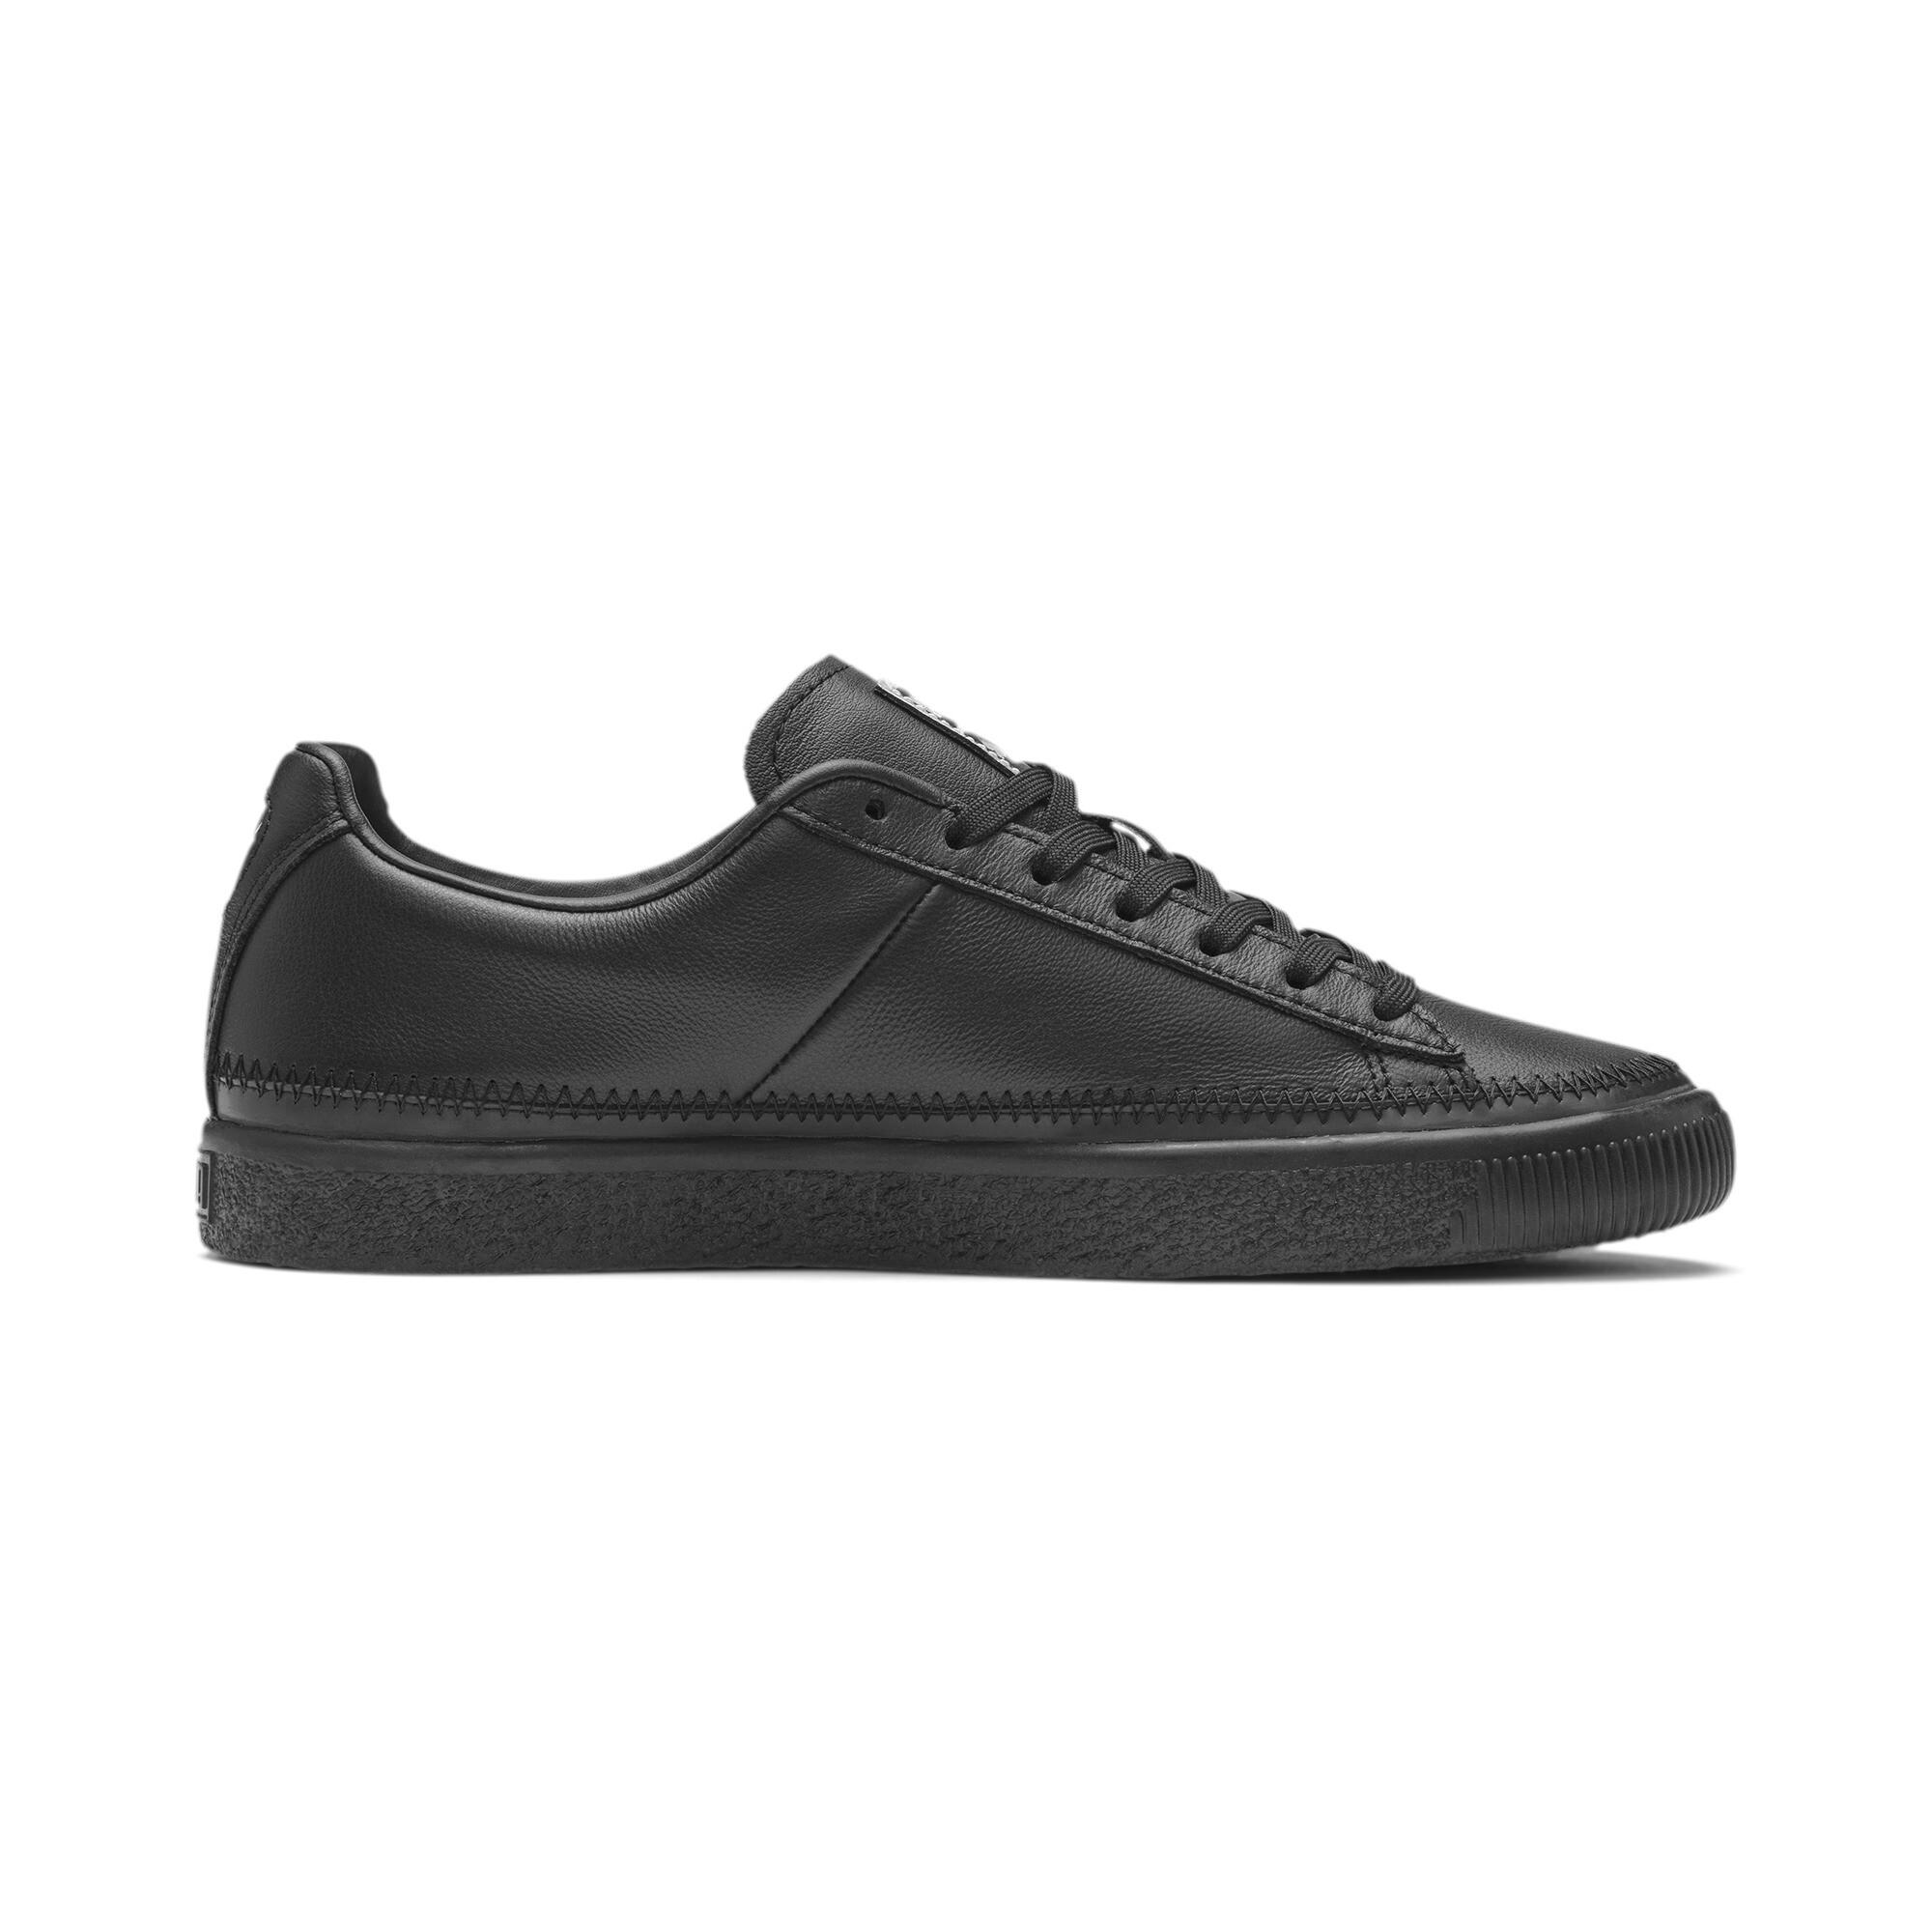 Indexbild 18 - PUMA Basket Stitch Sneaker Unisex Schuhe Neu